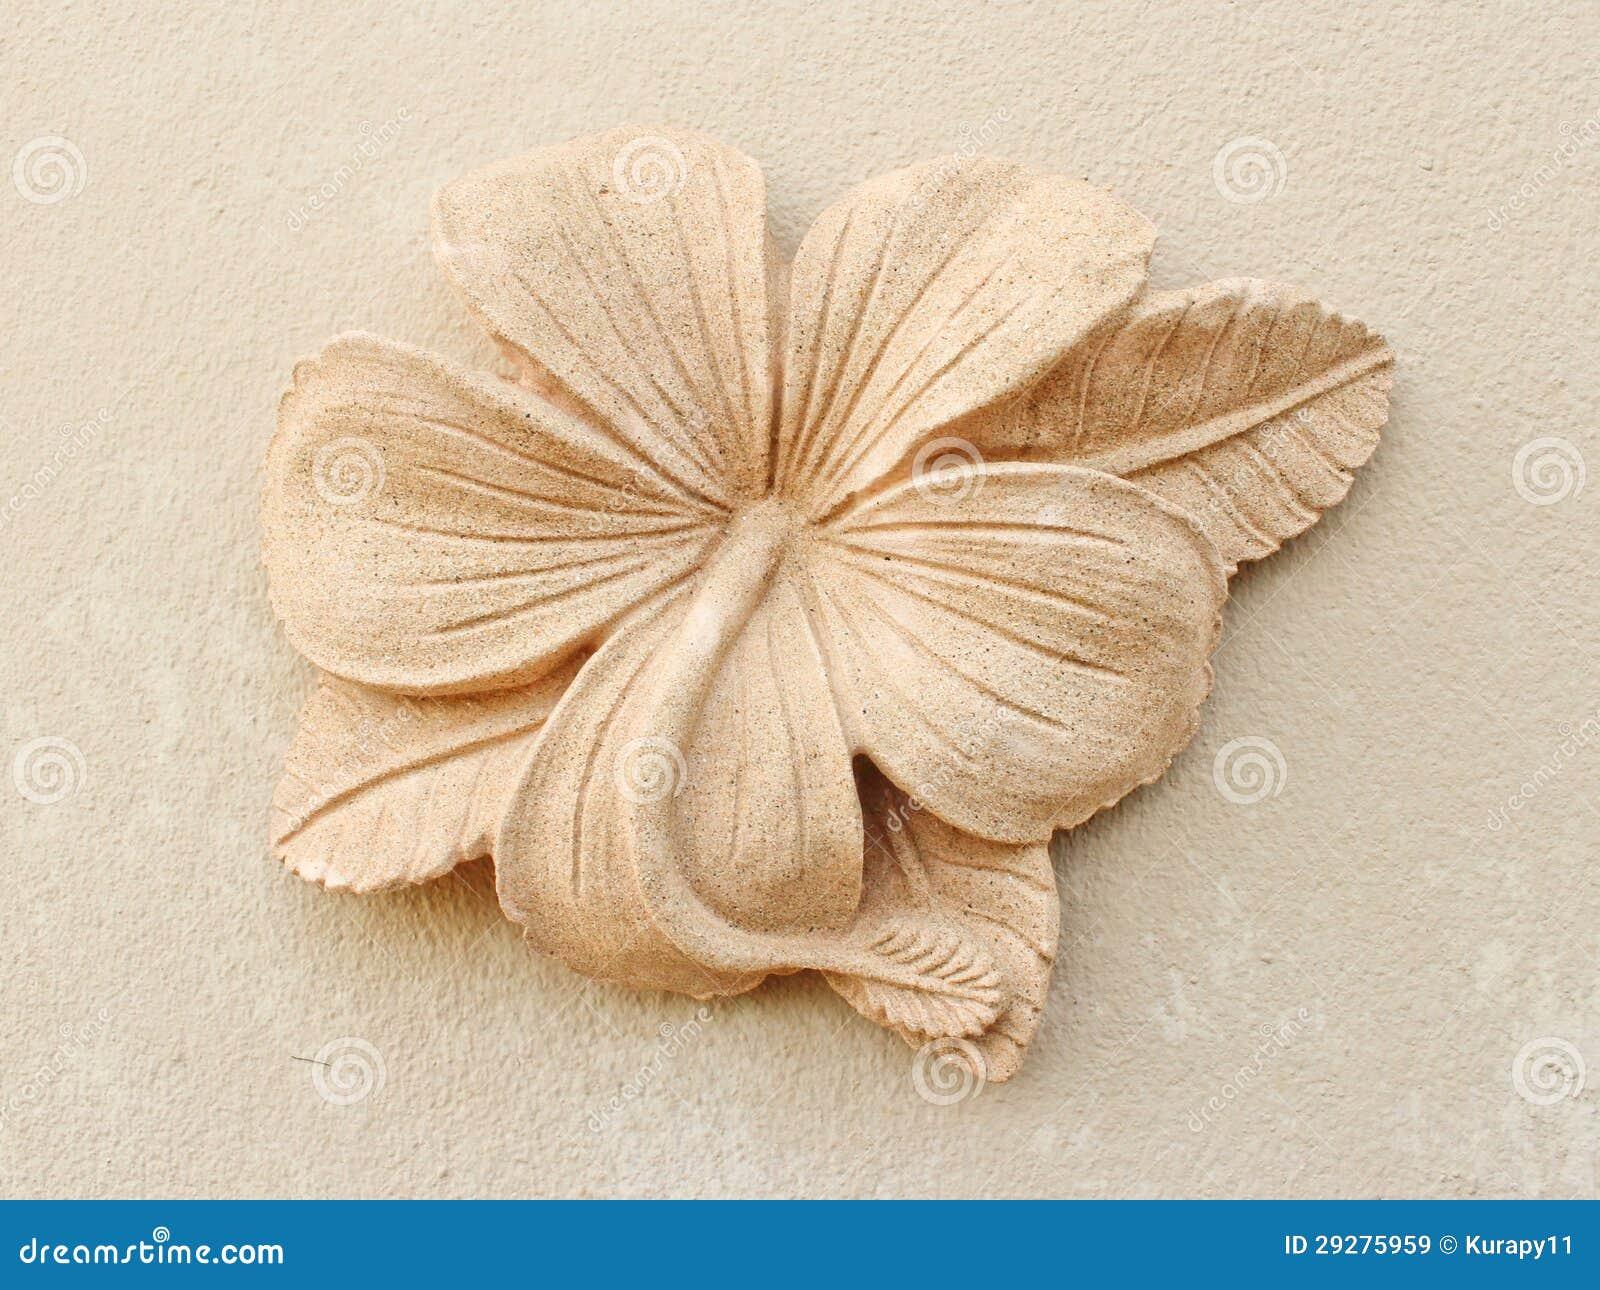 Stone Plumeria Craft Art Design Stock Image Image Of Ordered Neat